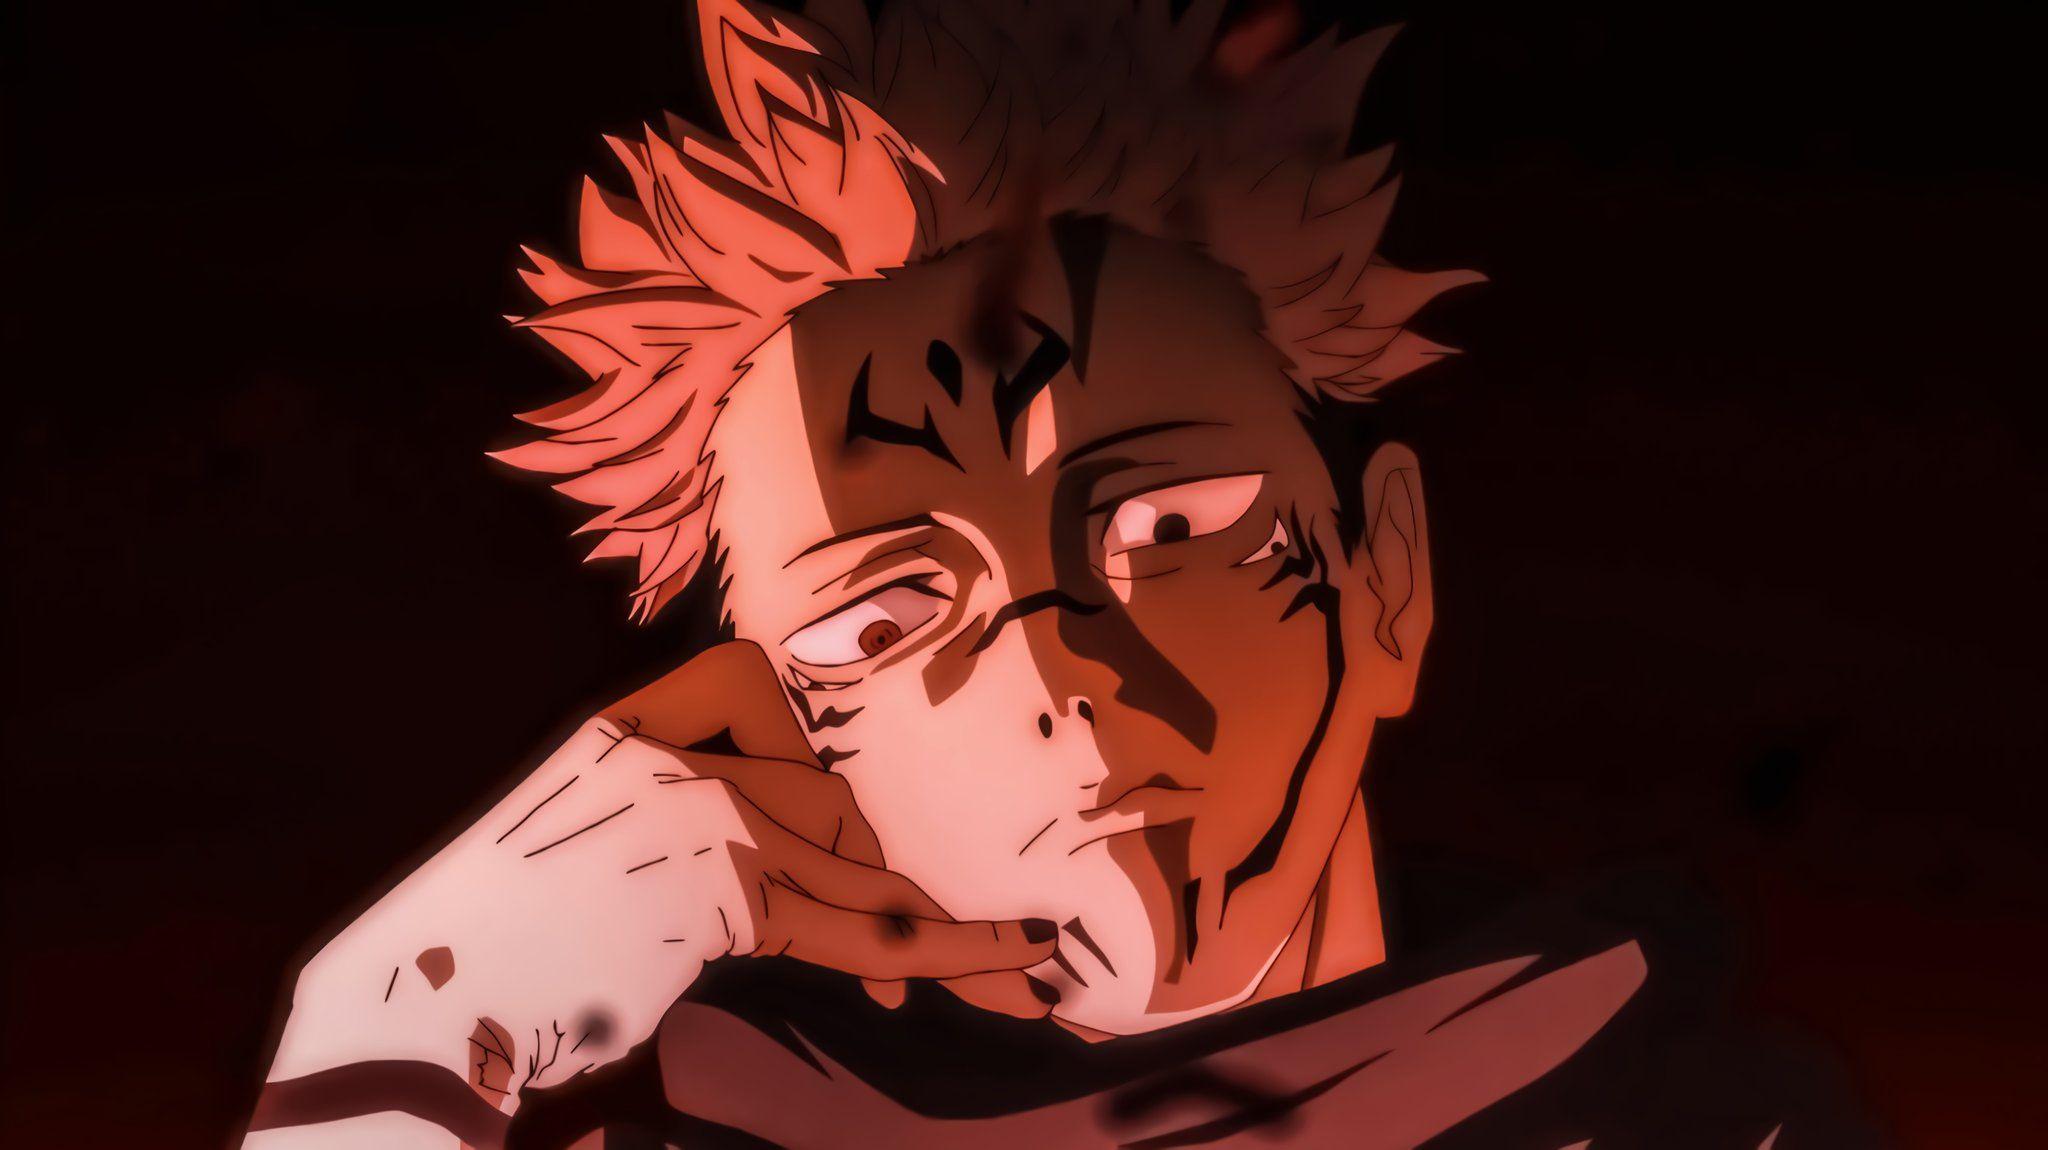 Anime On Twitter In 2021 Anime Jujutsu Aesthetic Anime